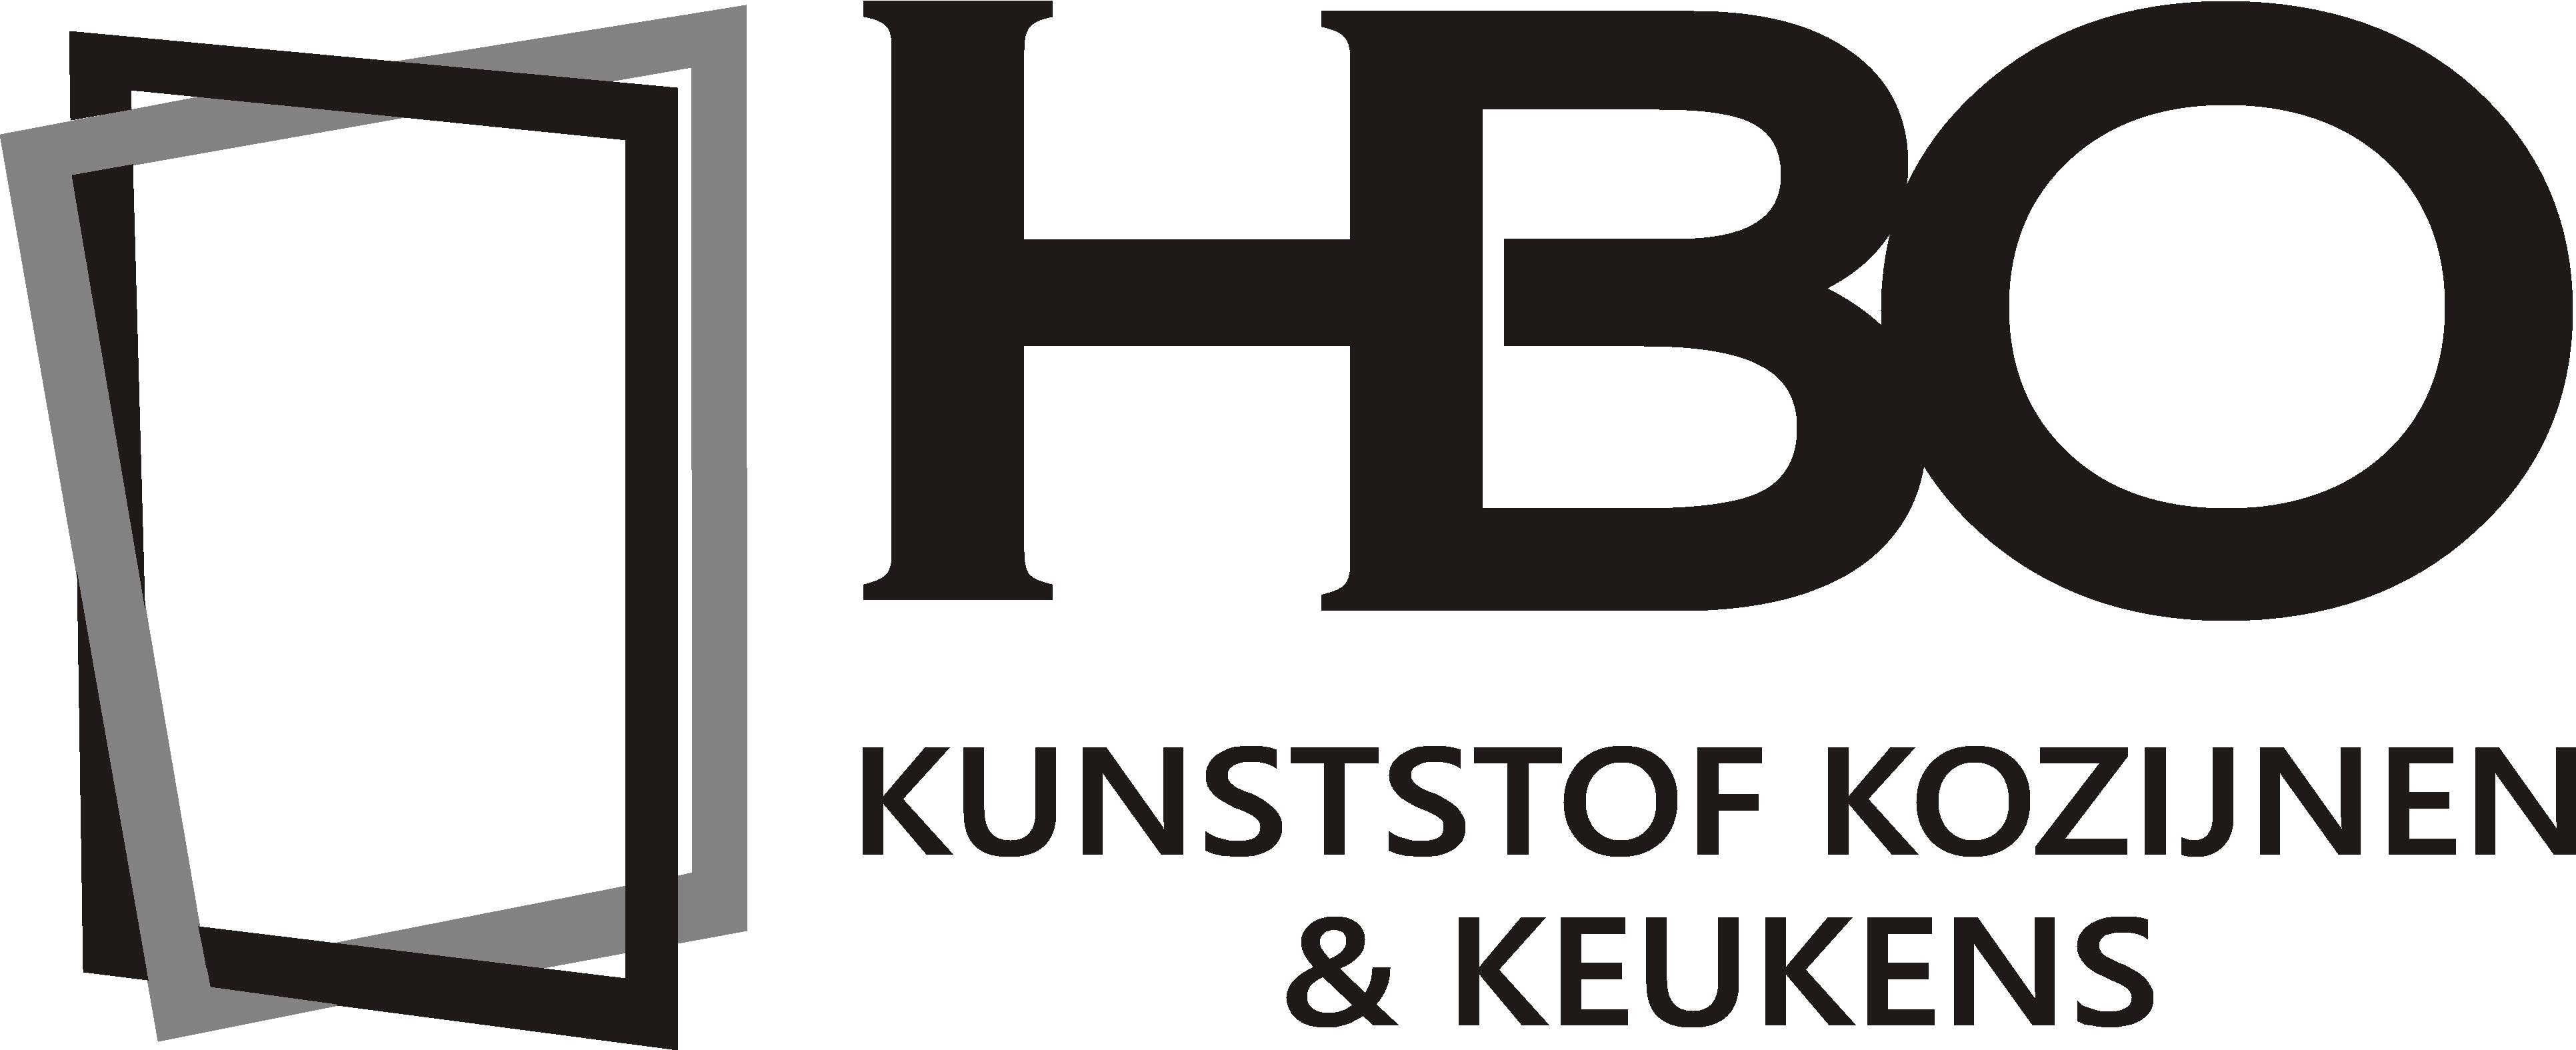 HBO Kozijnen